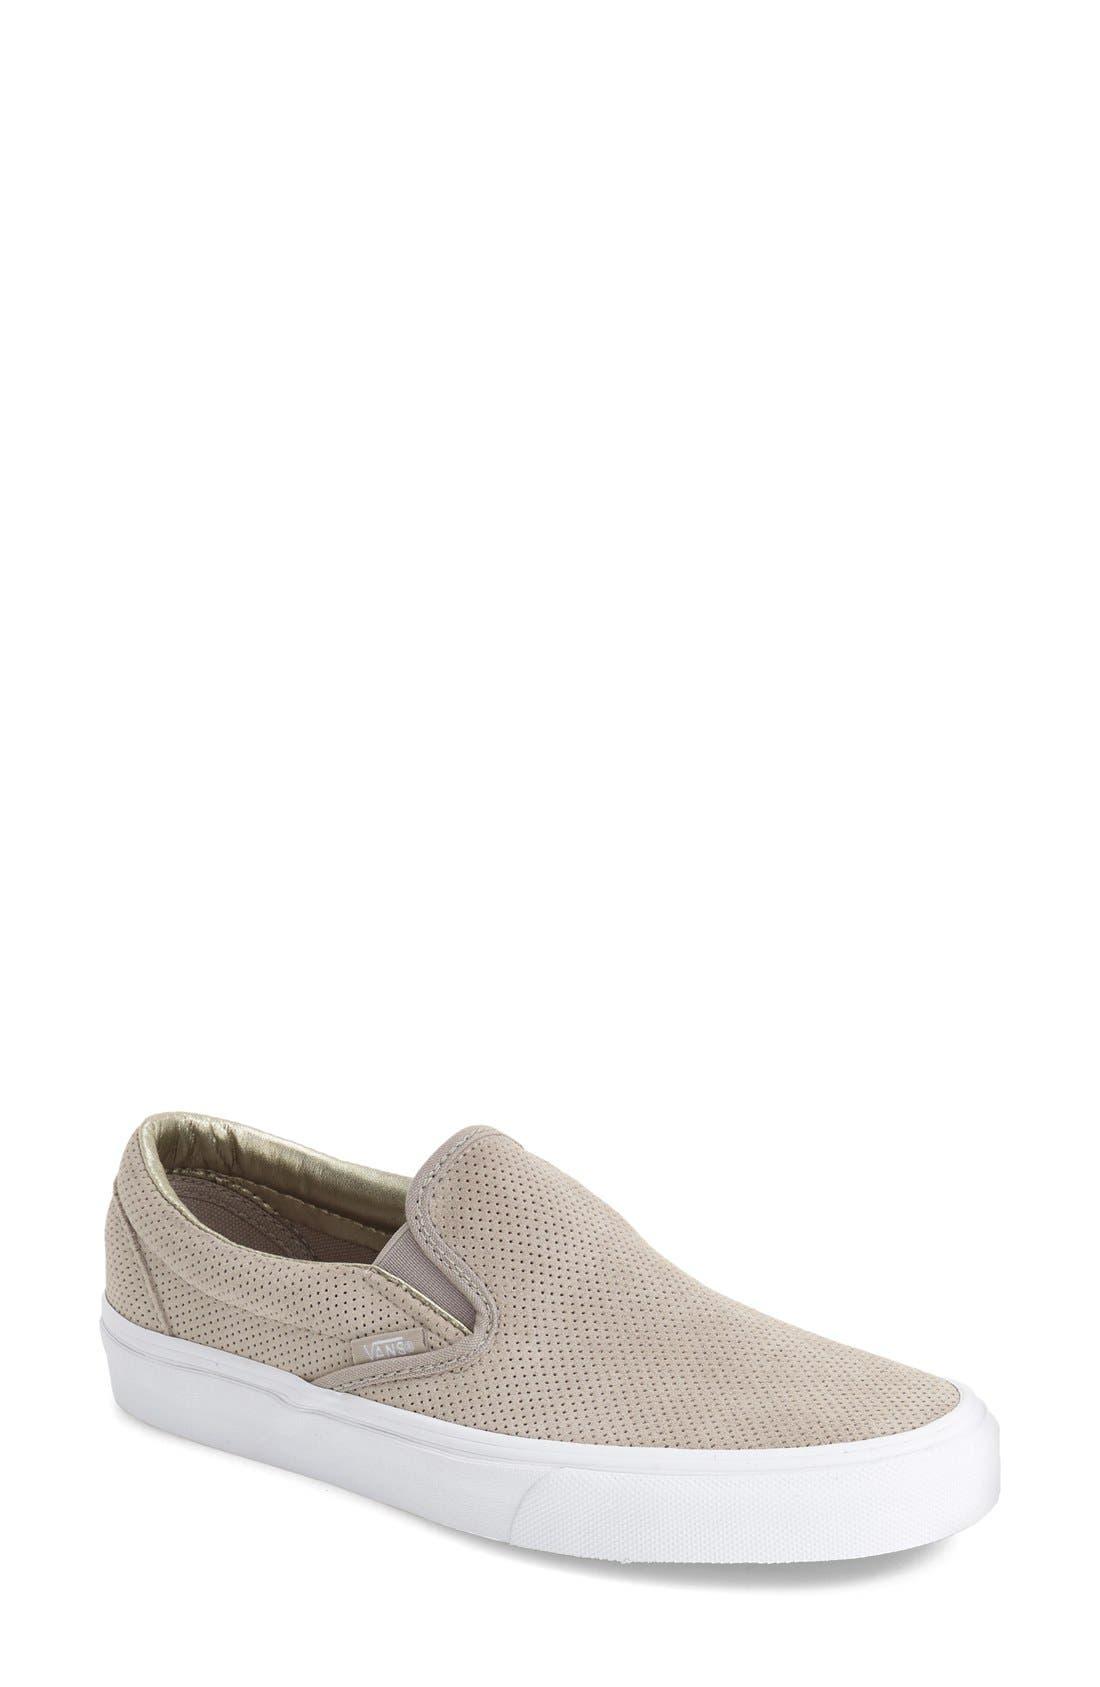 ,                             Classic Slip-On Sneaker,                             Main thumbnail 31, color,                             250